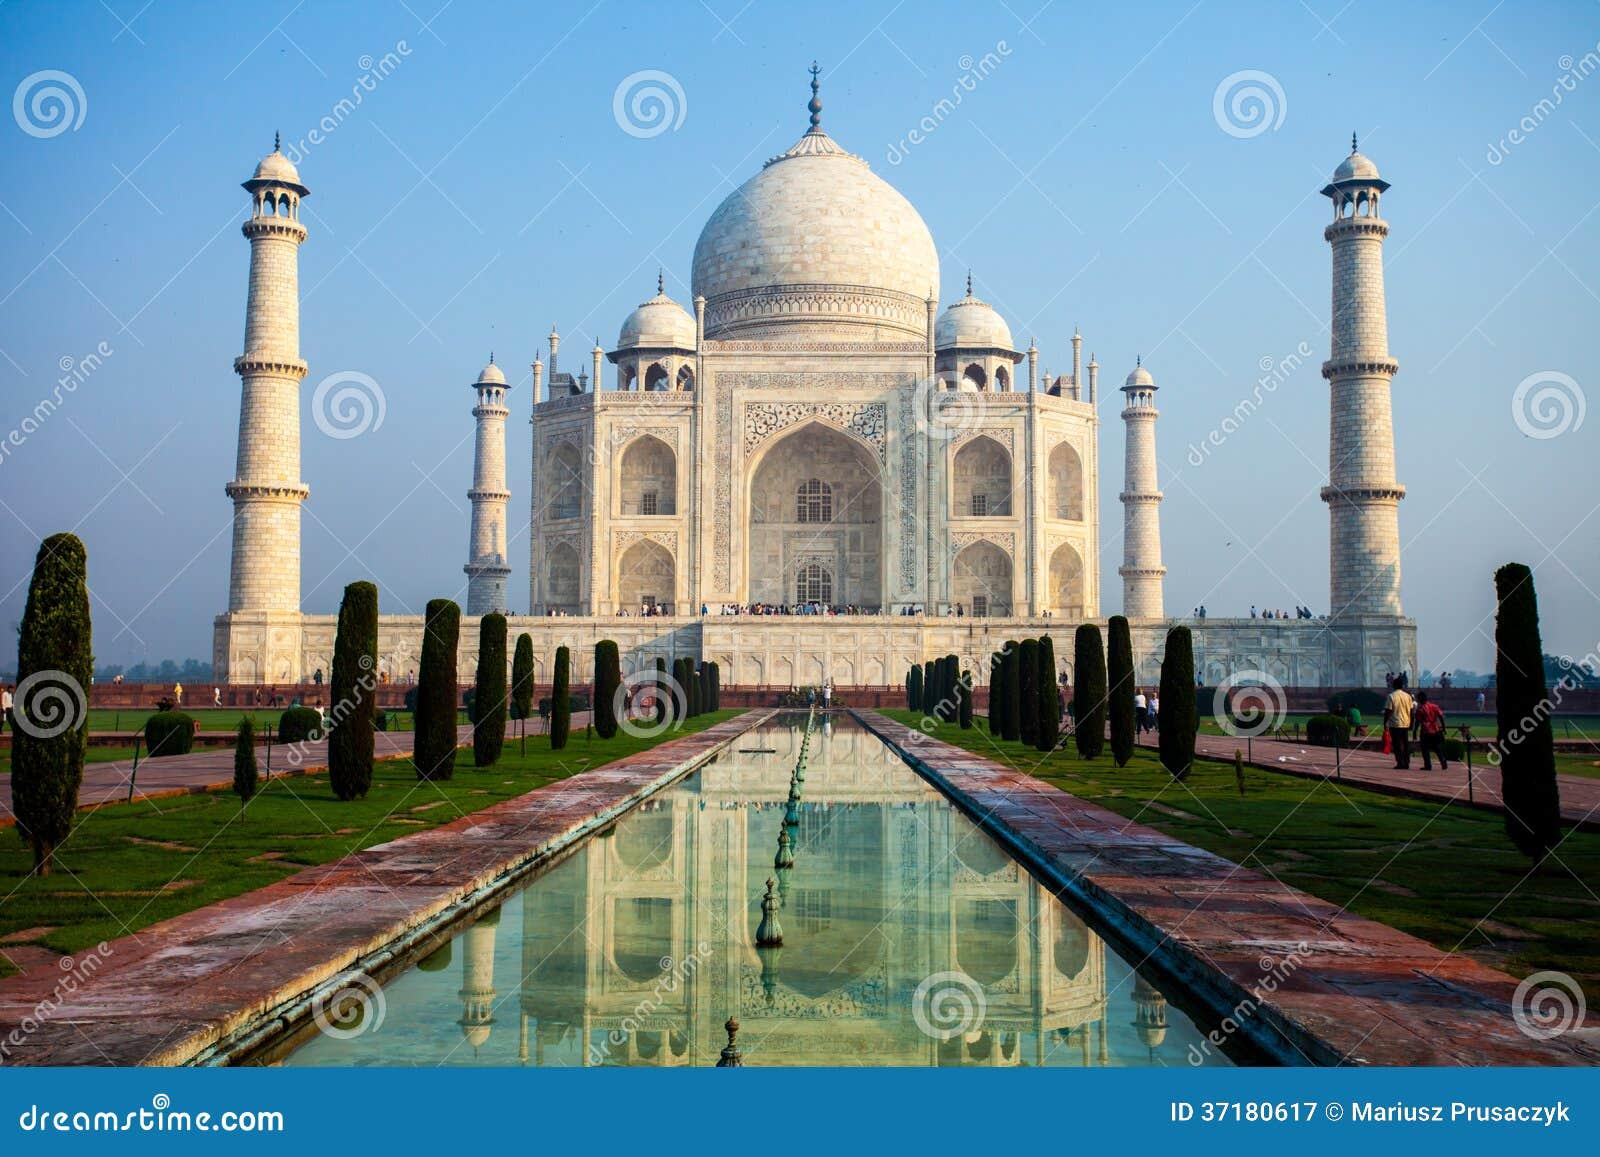 Taj Mahal , A Famous Historical Monument, A Monument Of Love